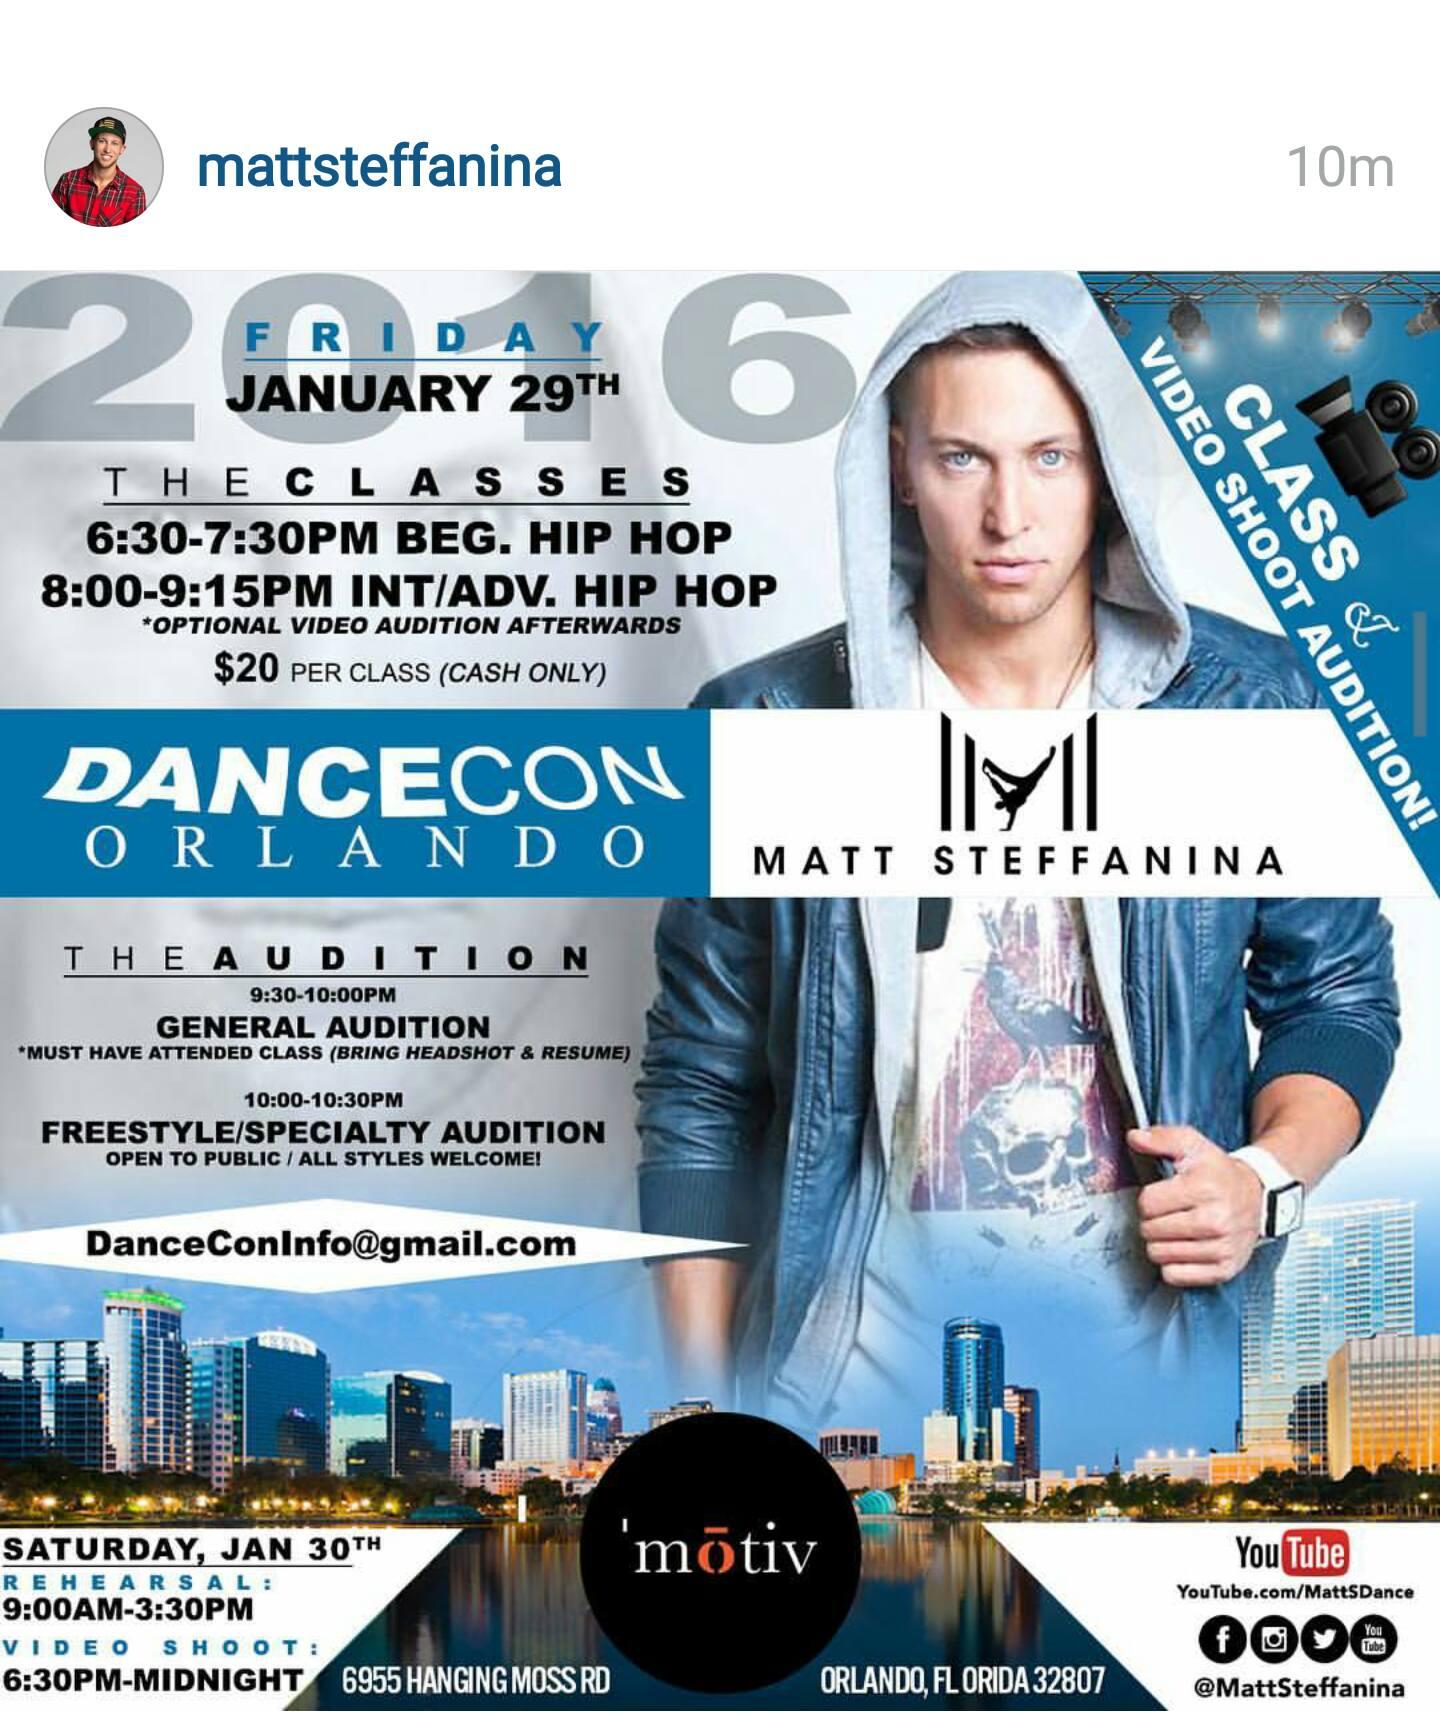 Matt Steffanina DanceCon